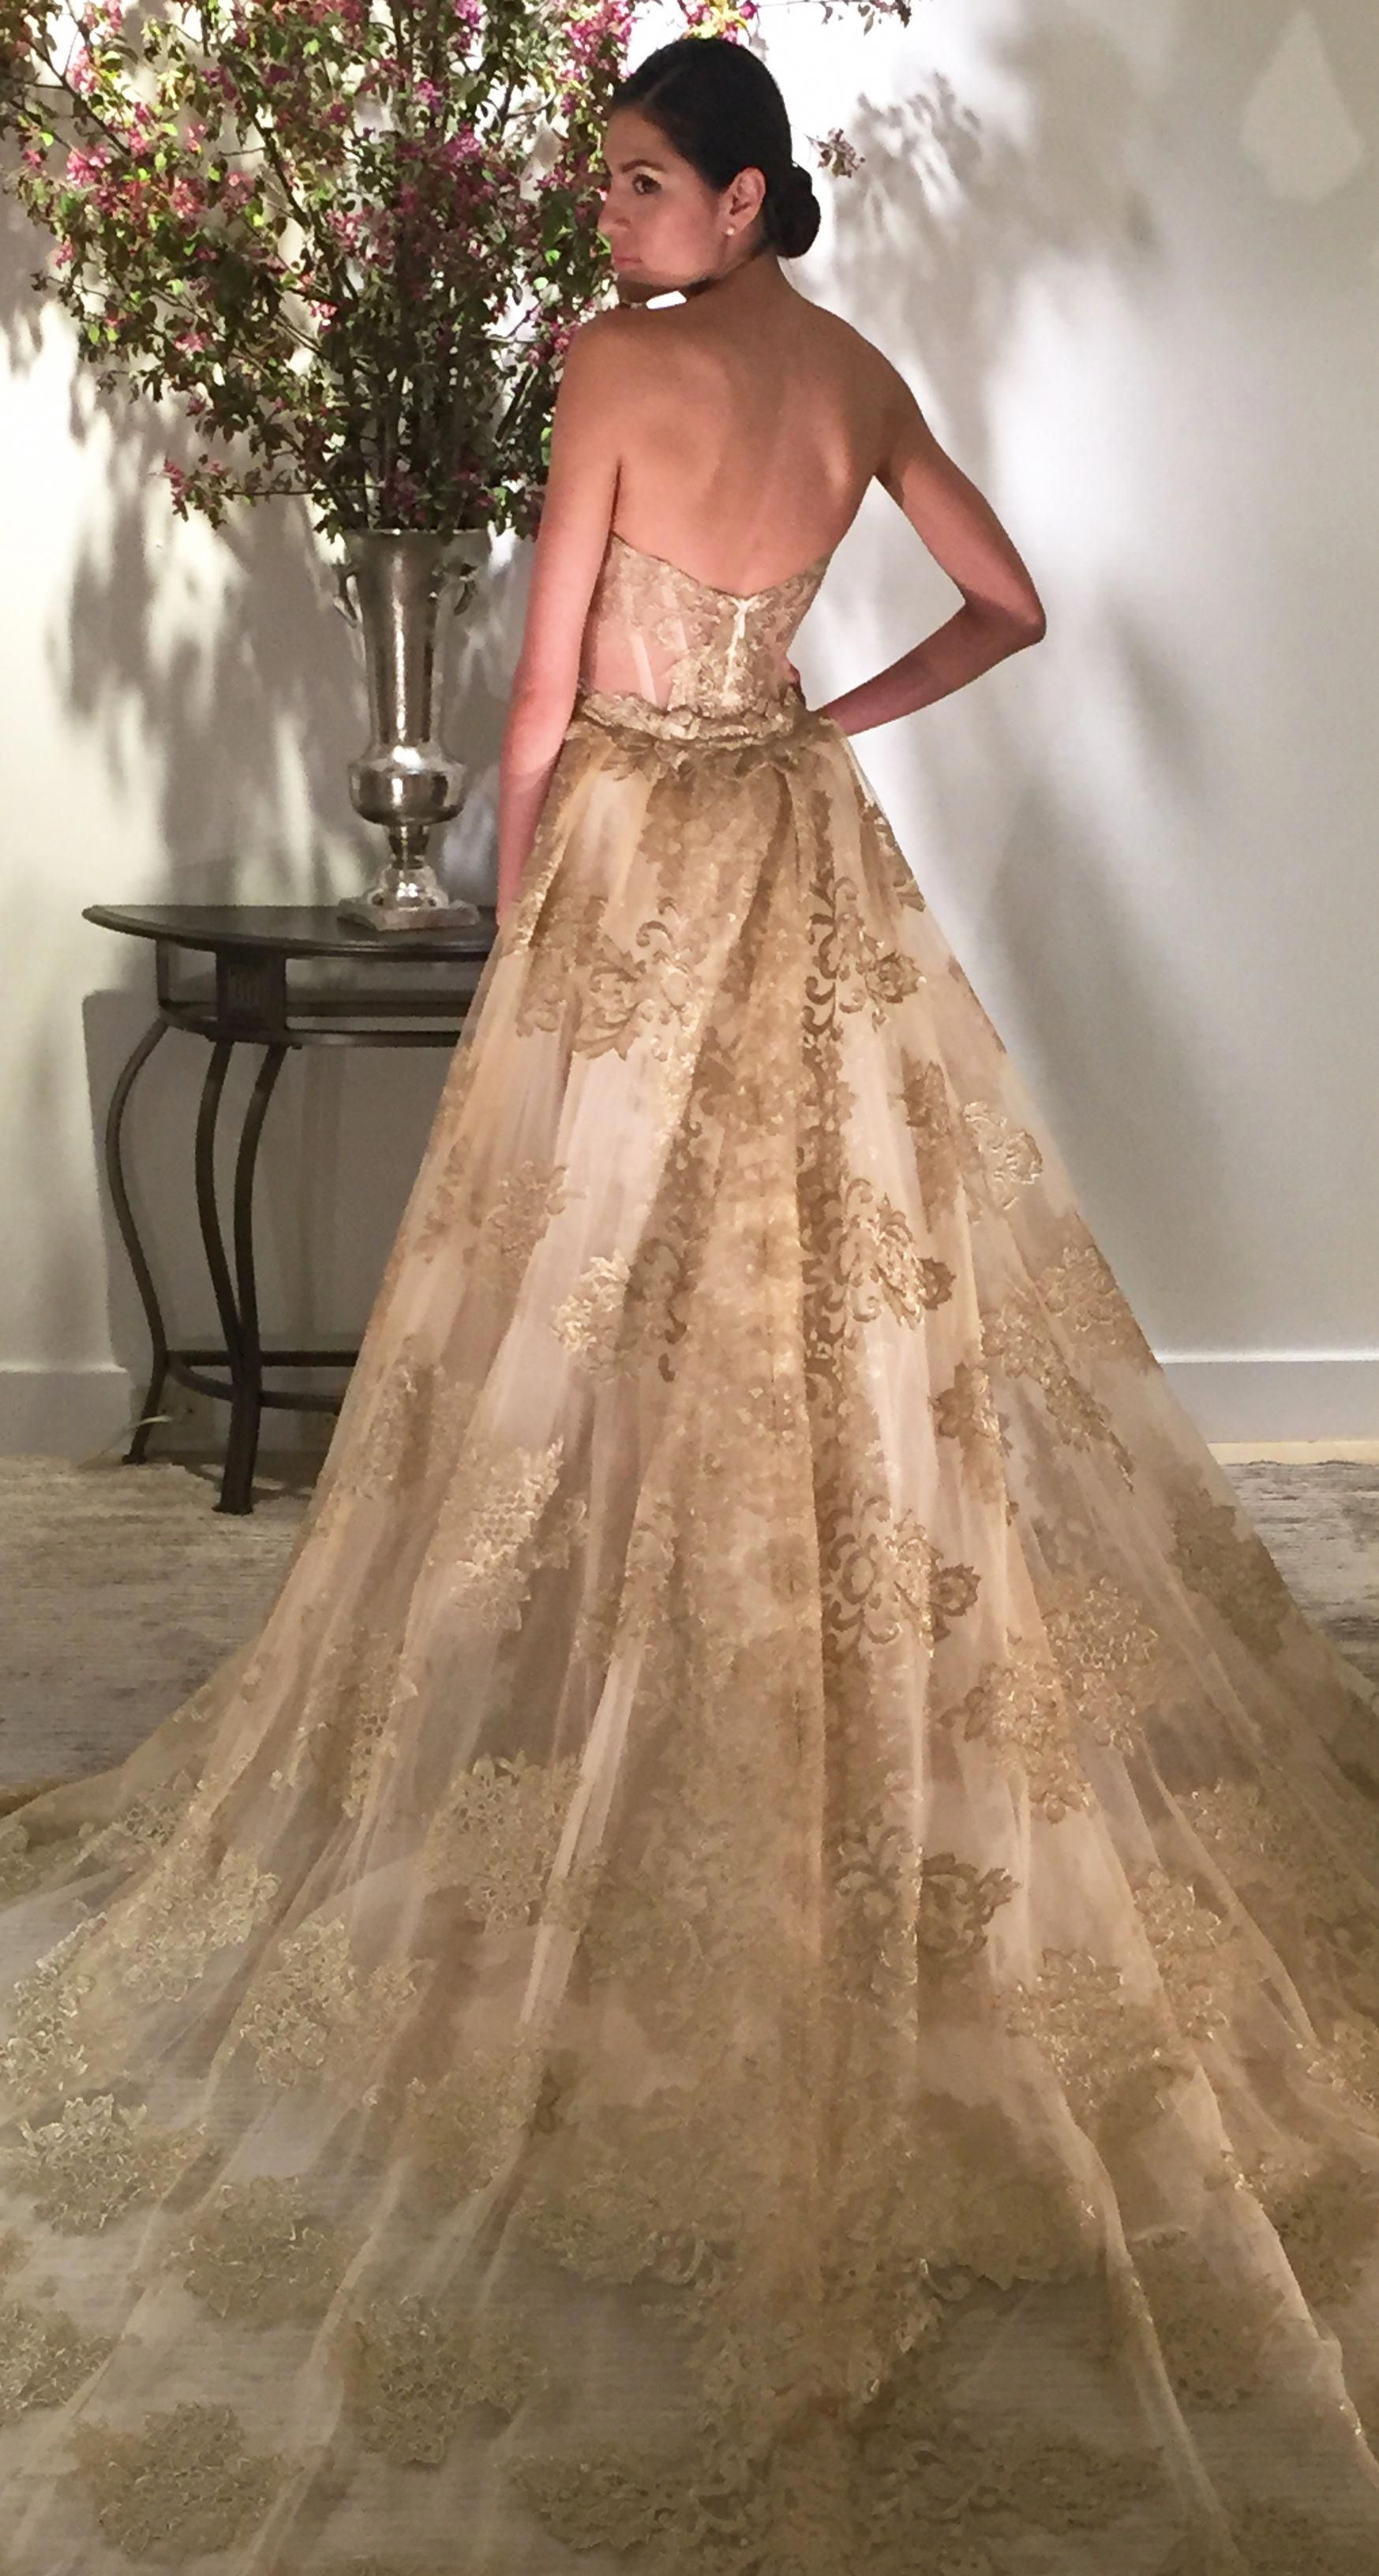 Gwendelyn in 2020 Gold wedding gowns, Colored wedding